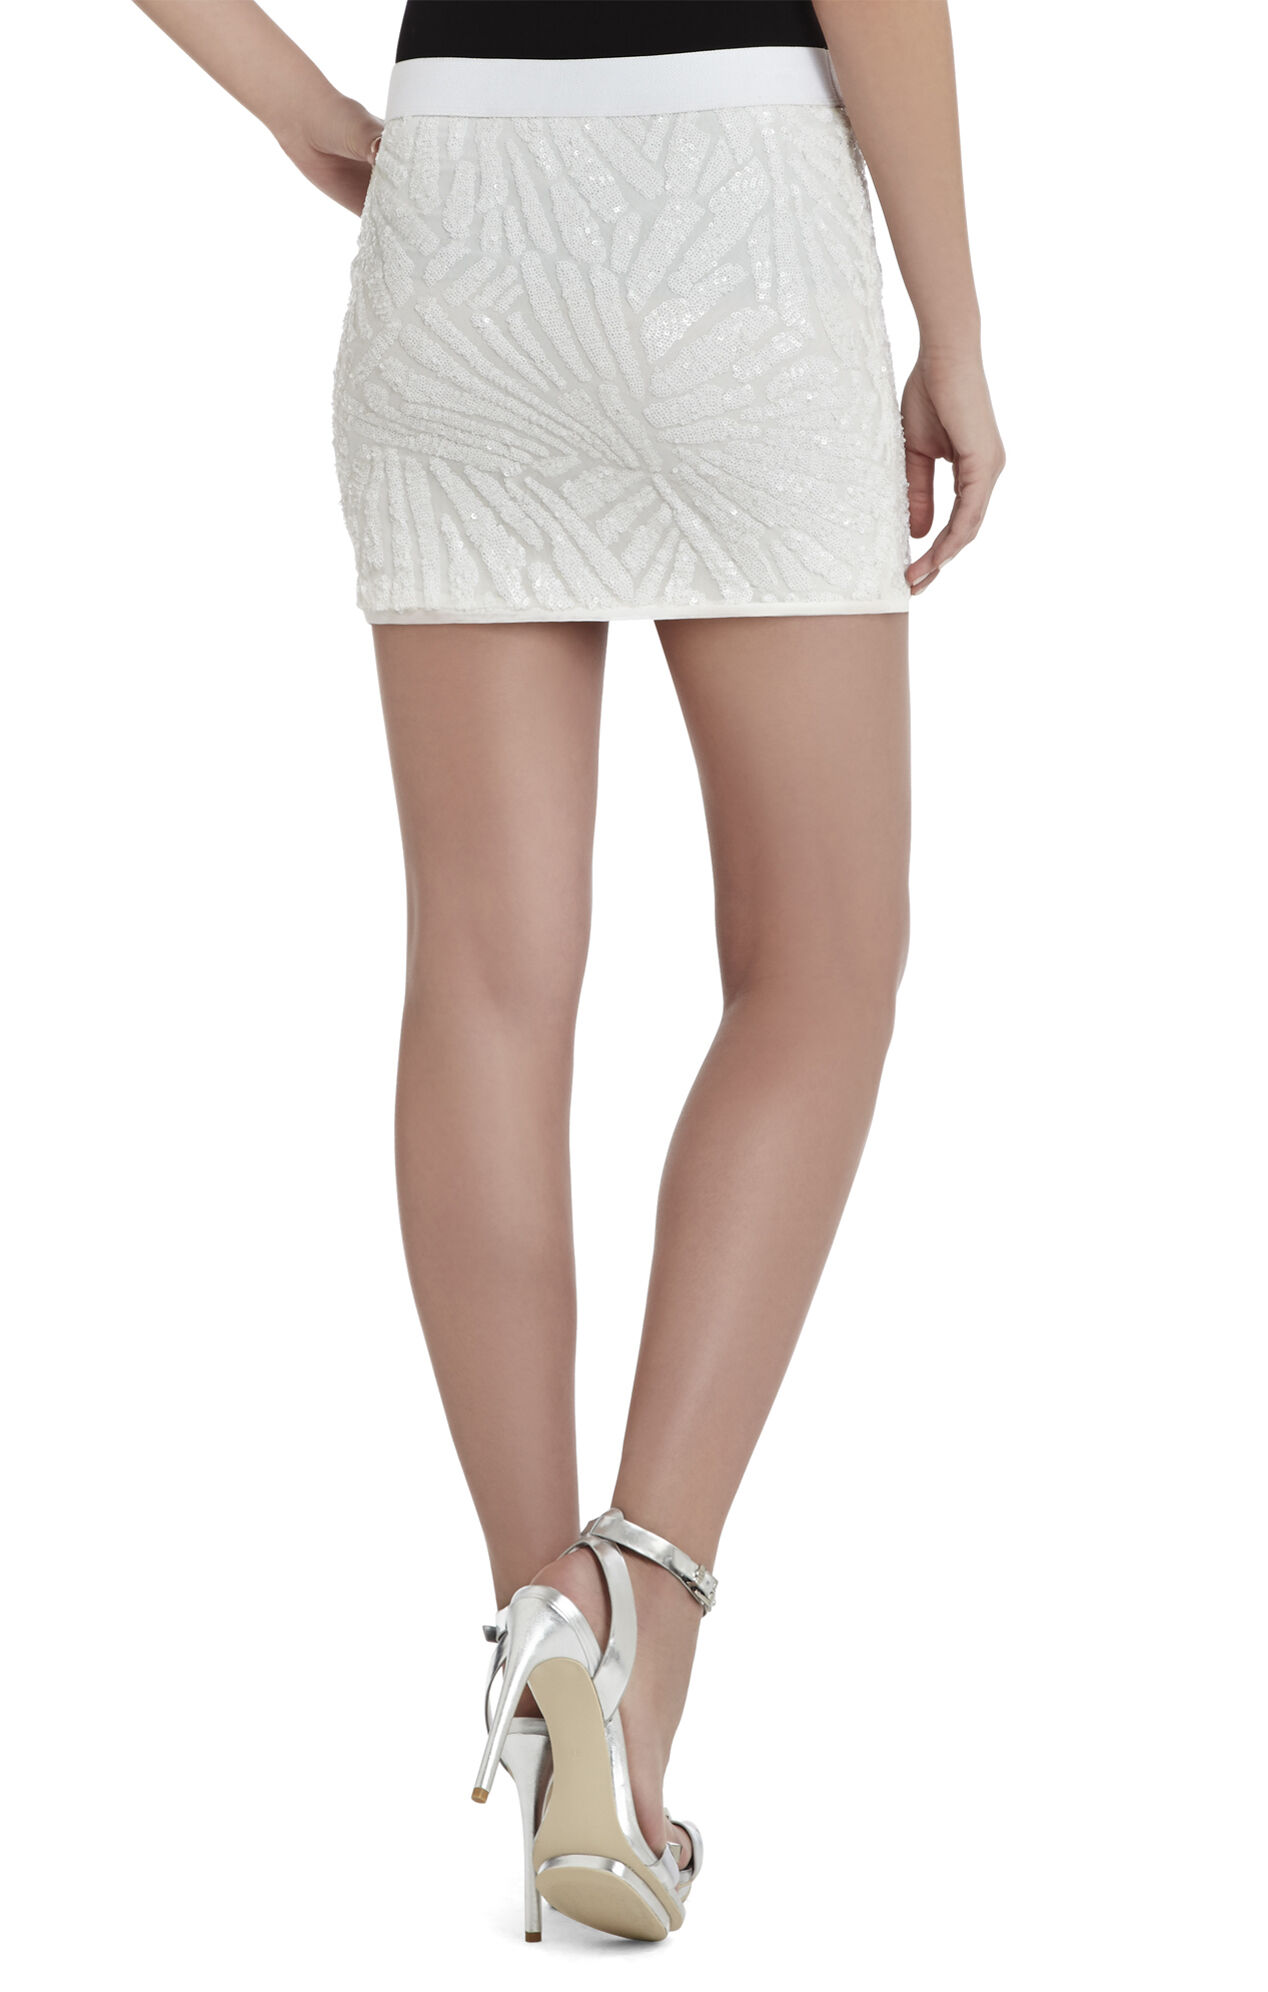 Paxton Deco Sequin-Applique Mini Skirt